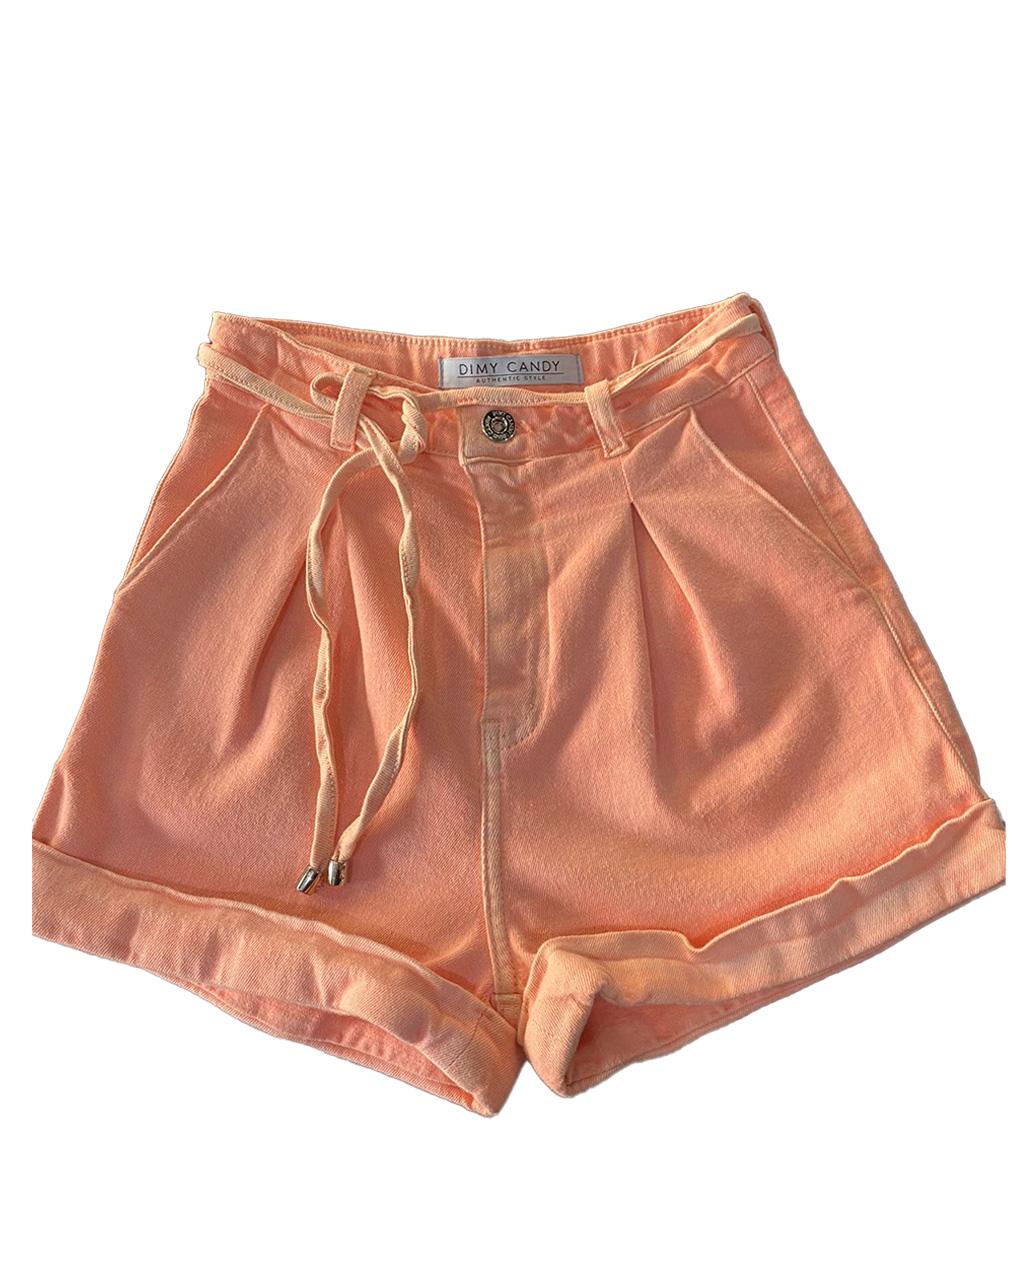 Shorts Teen Feminino com Pregas Dimy Candy